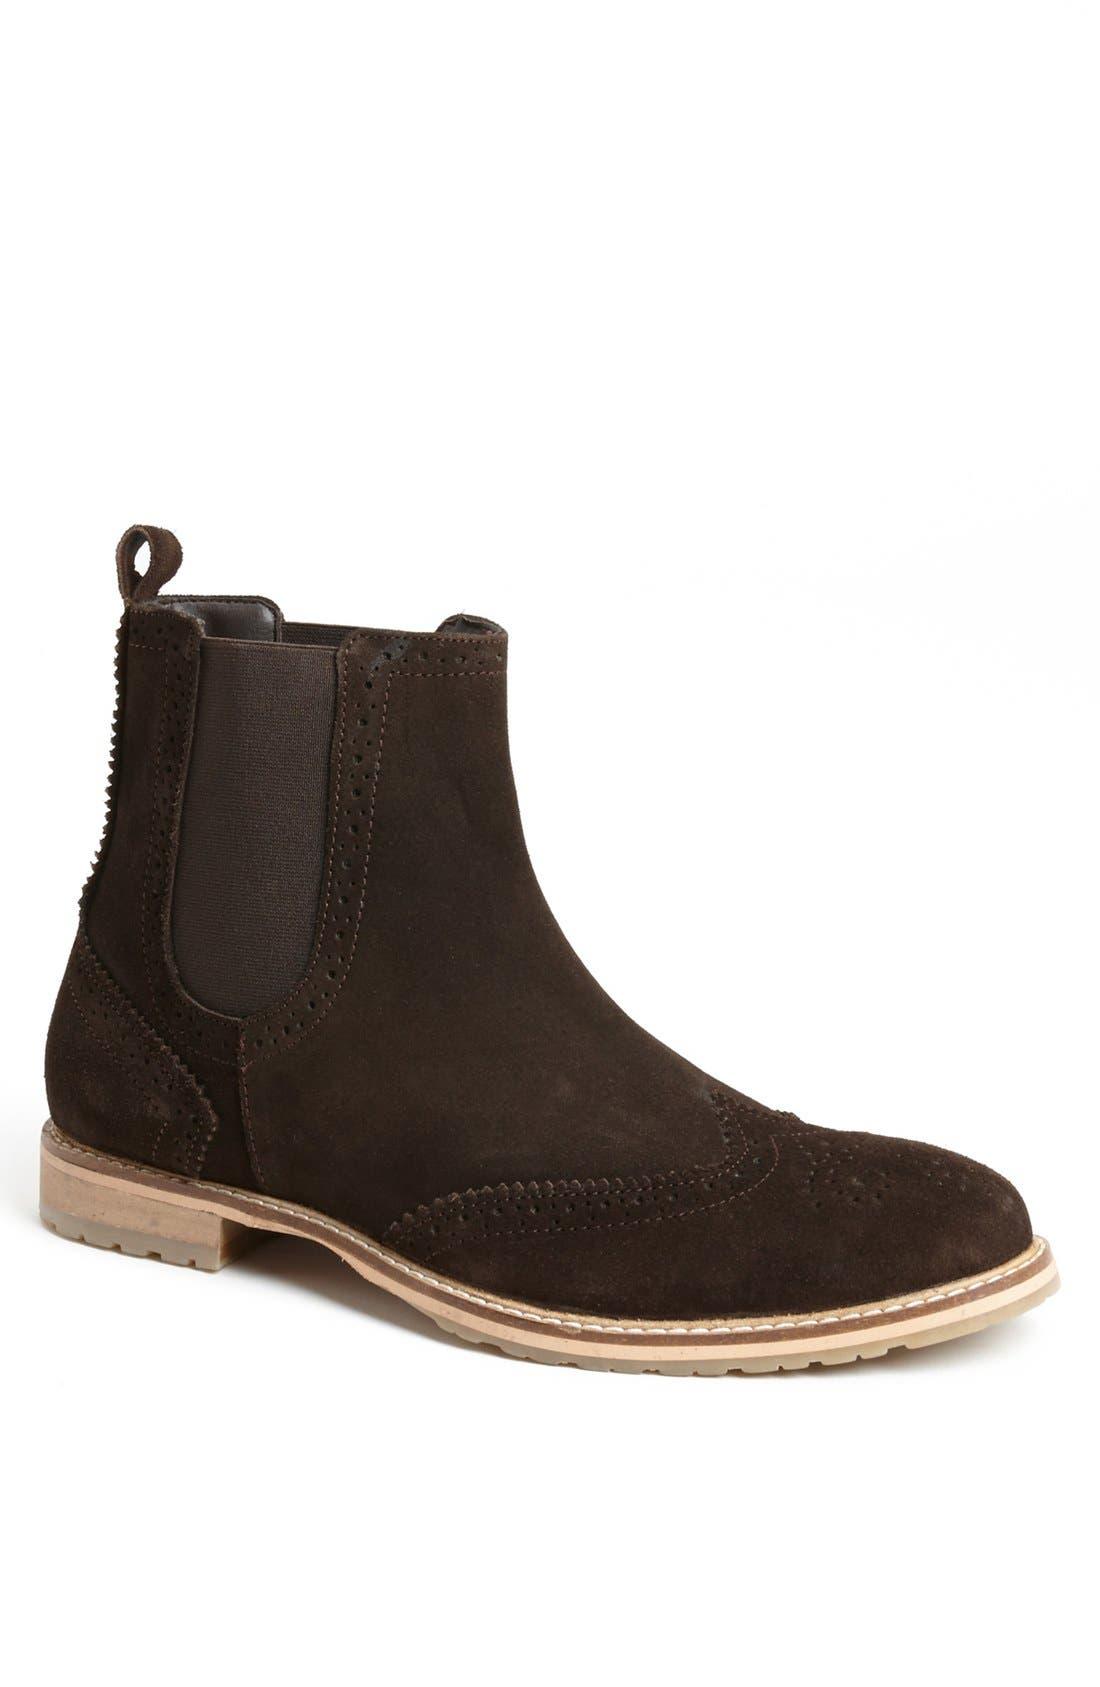 Main Image - Ben Sherman 'Bruno' Wingtip Chelsea Boot (Men)